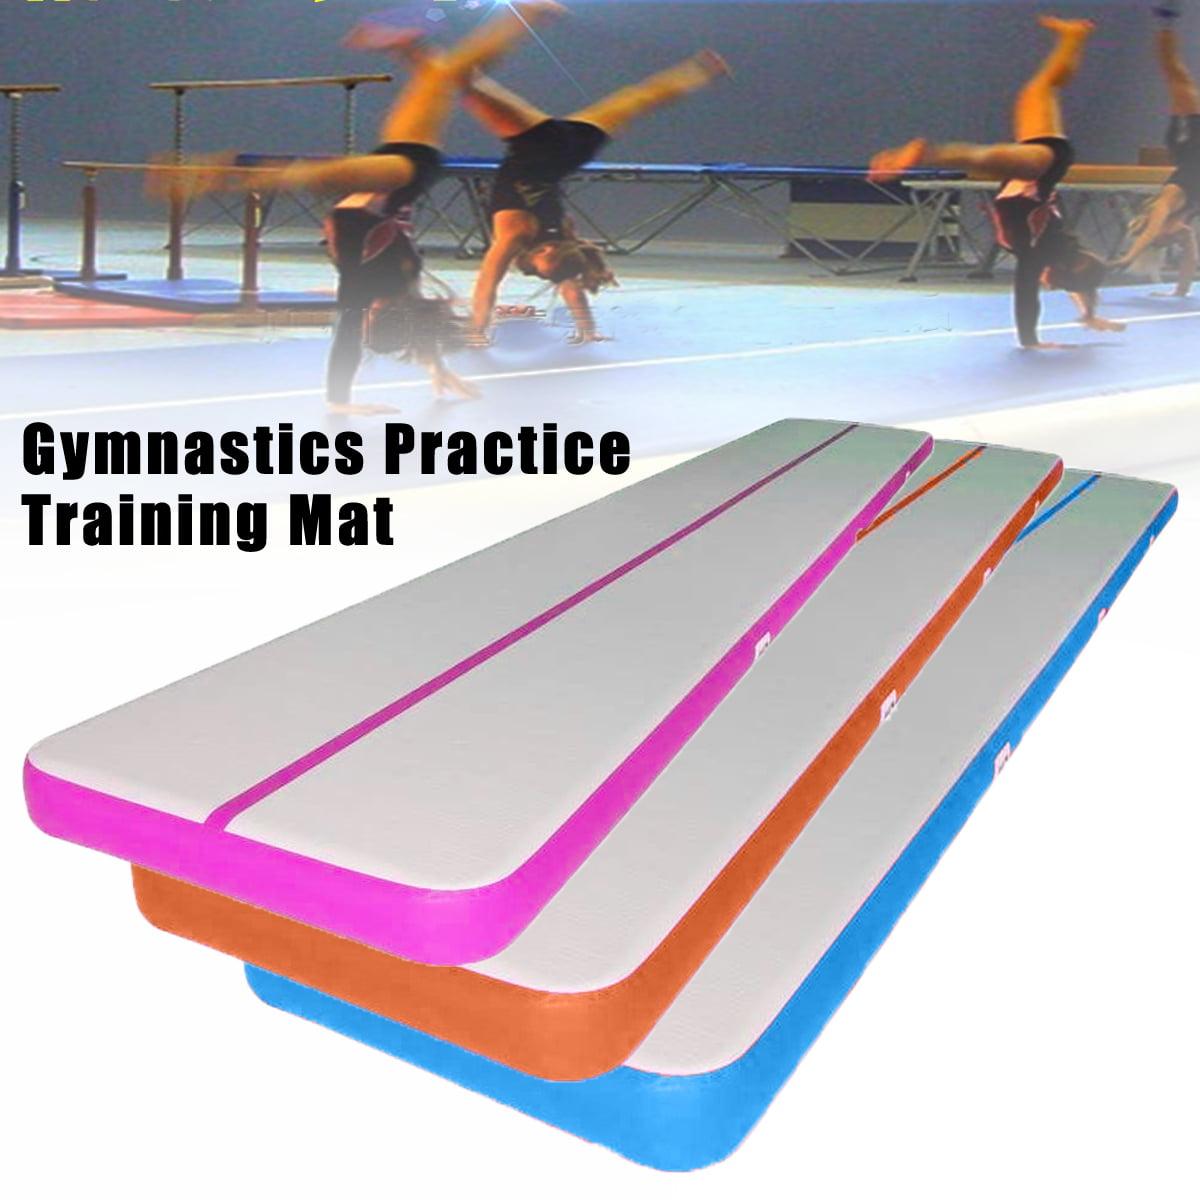 Inflatable Air Balance Beam GYM Gymnastics Tumbling Mat Practice Training Pad Air Tumbling Track with Air Pump